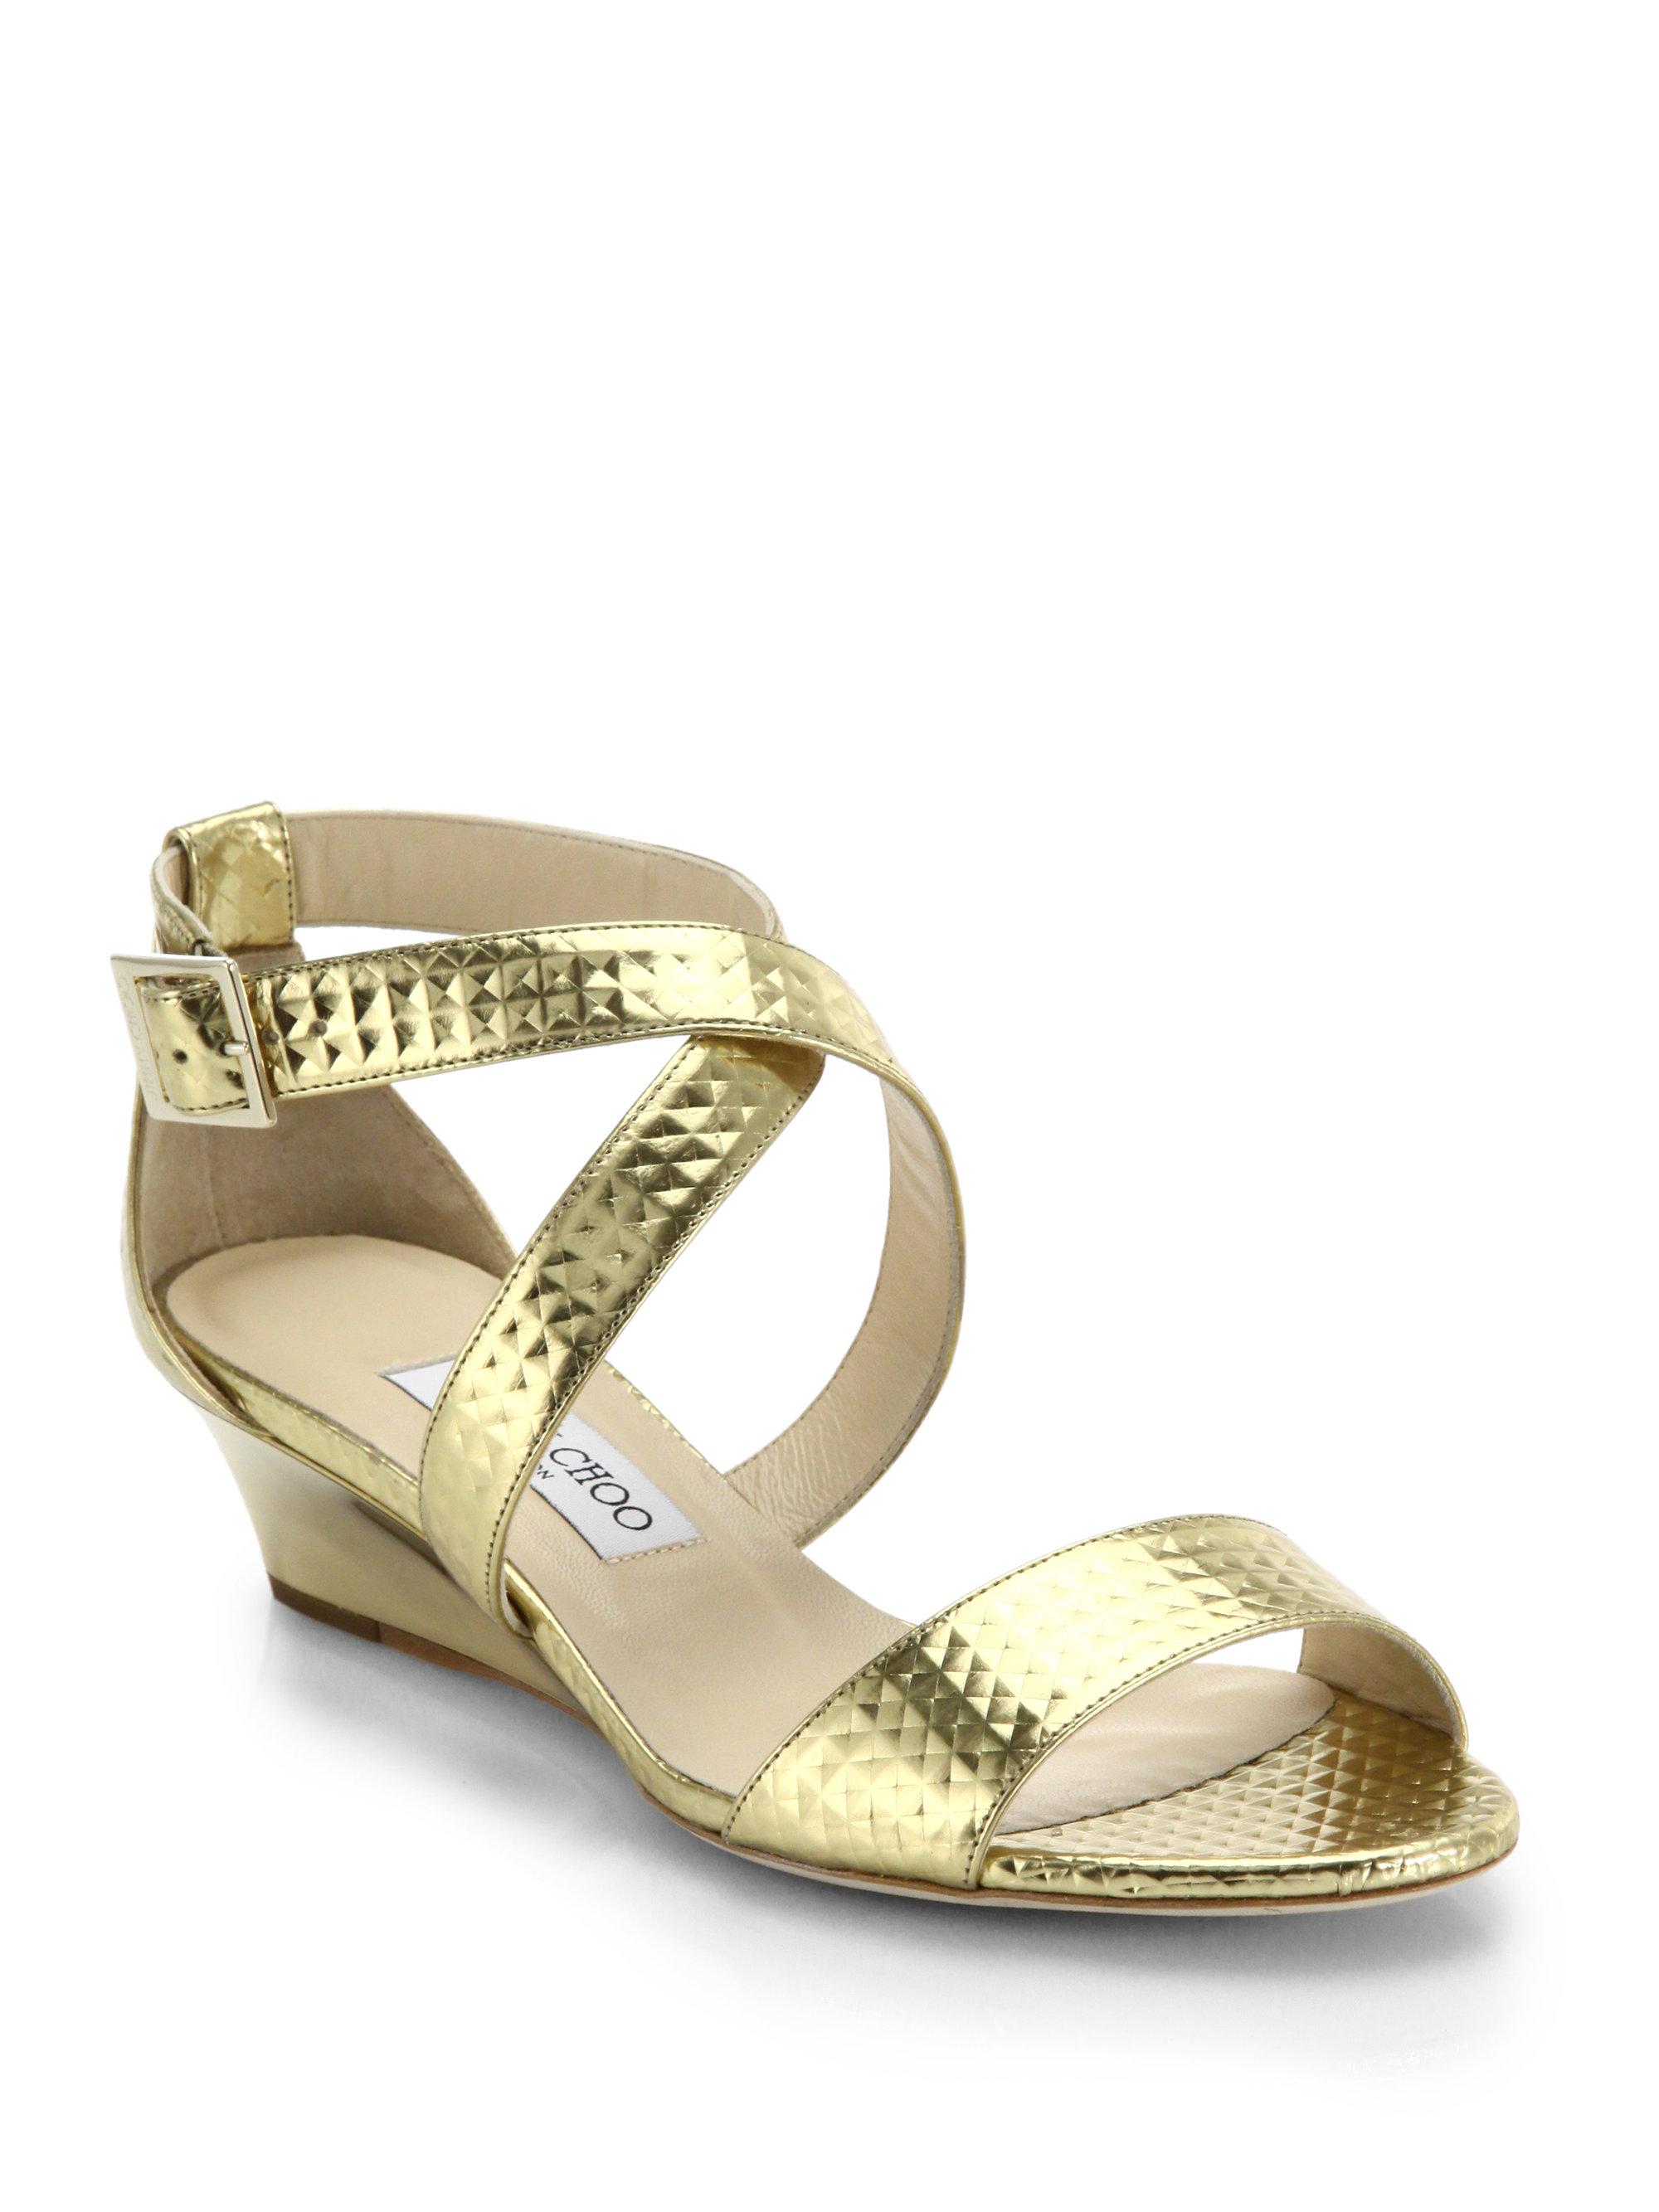 lyst jimmy choo chiara metallic leather wedge sandals in